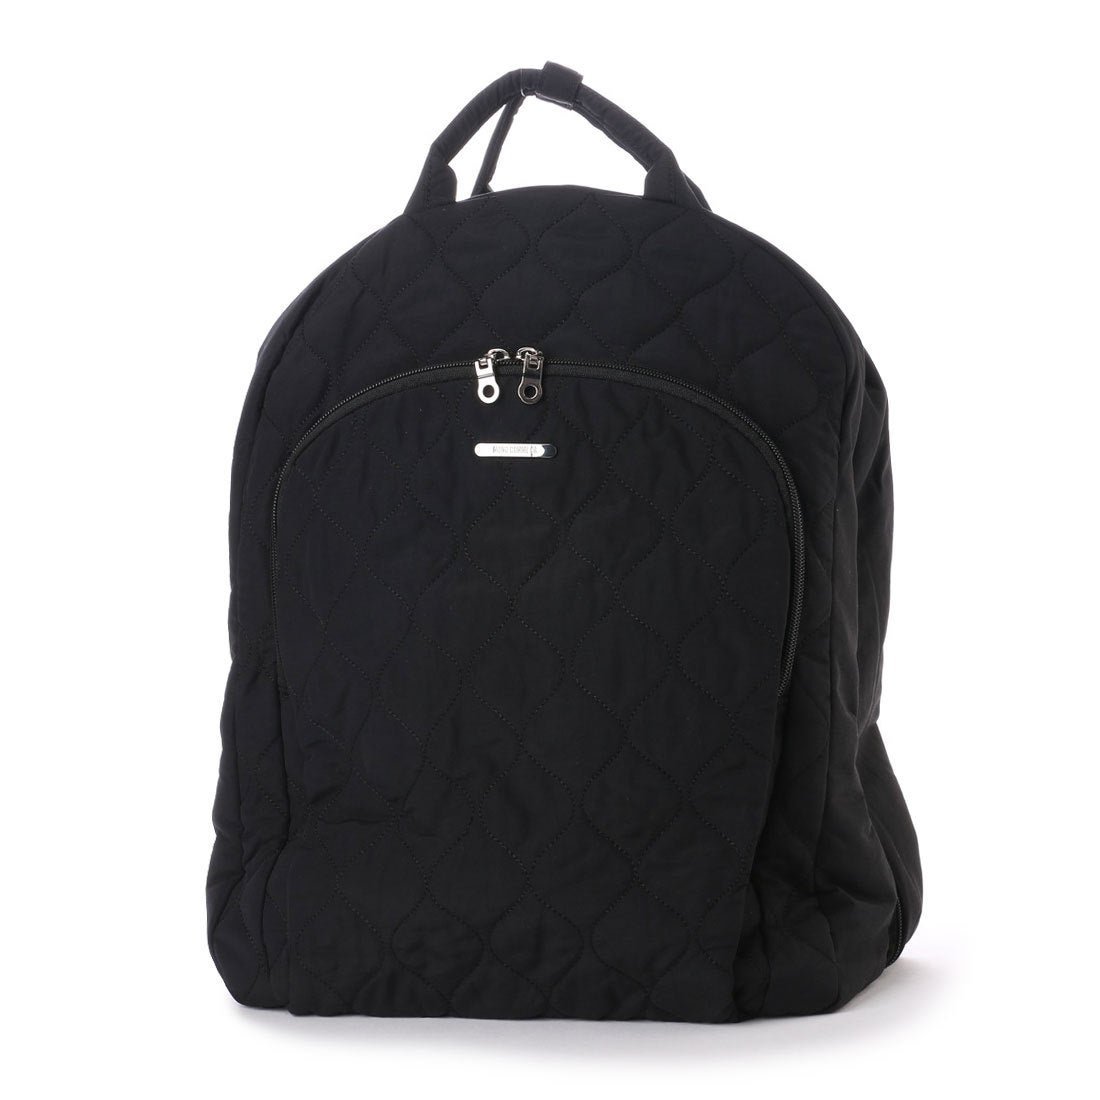 7c7a41cb0a コムサイズム COMME CA ISM MONOキャリーバッグのようなリュック (ブラック) -靴&ファッション通販 ロコンド〜自宅で試着、気軽に返品